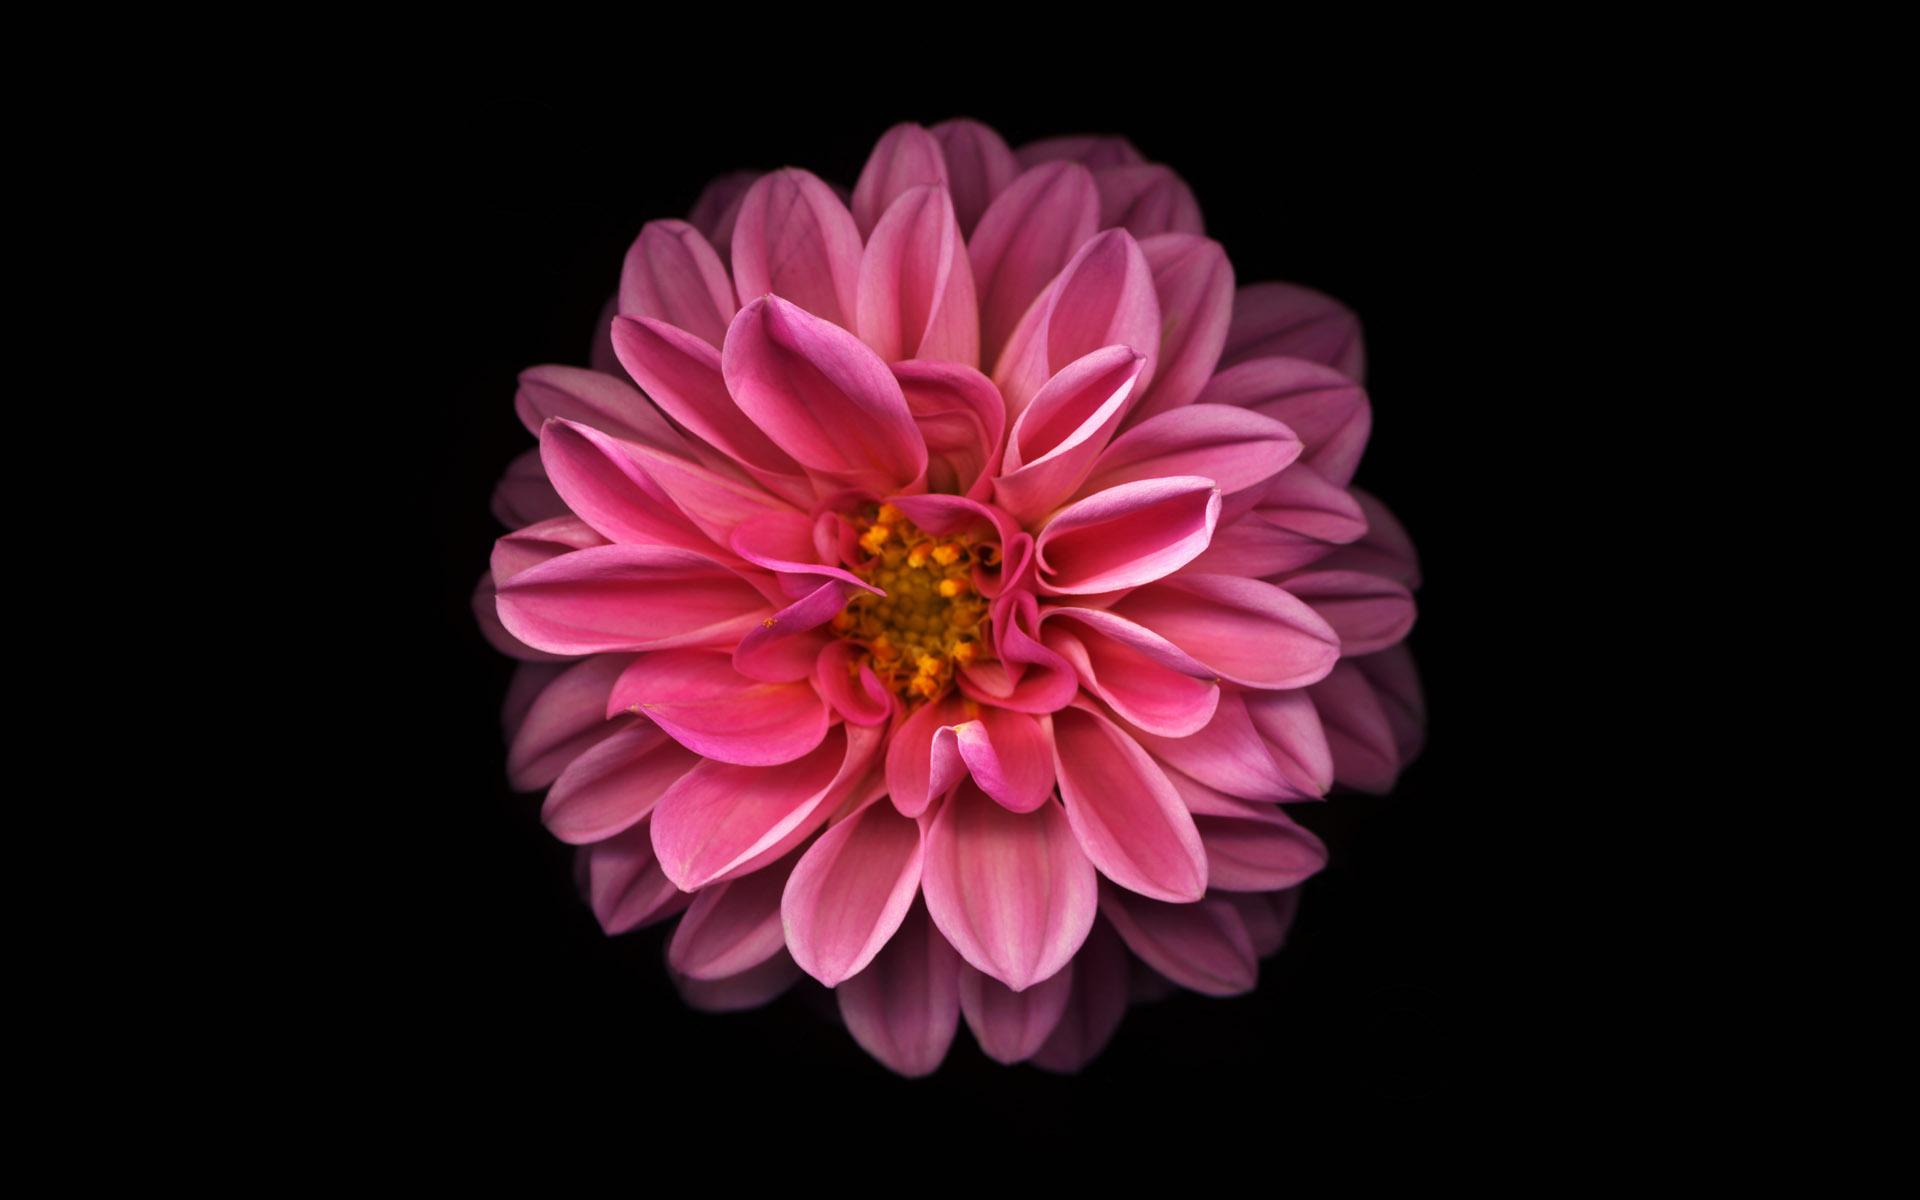 Цветок георгины на темном фоне